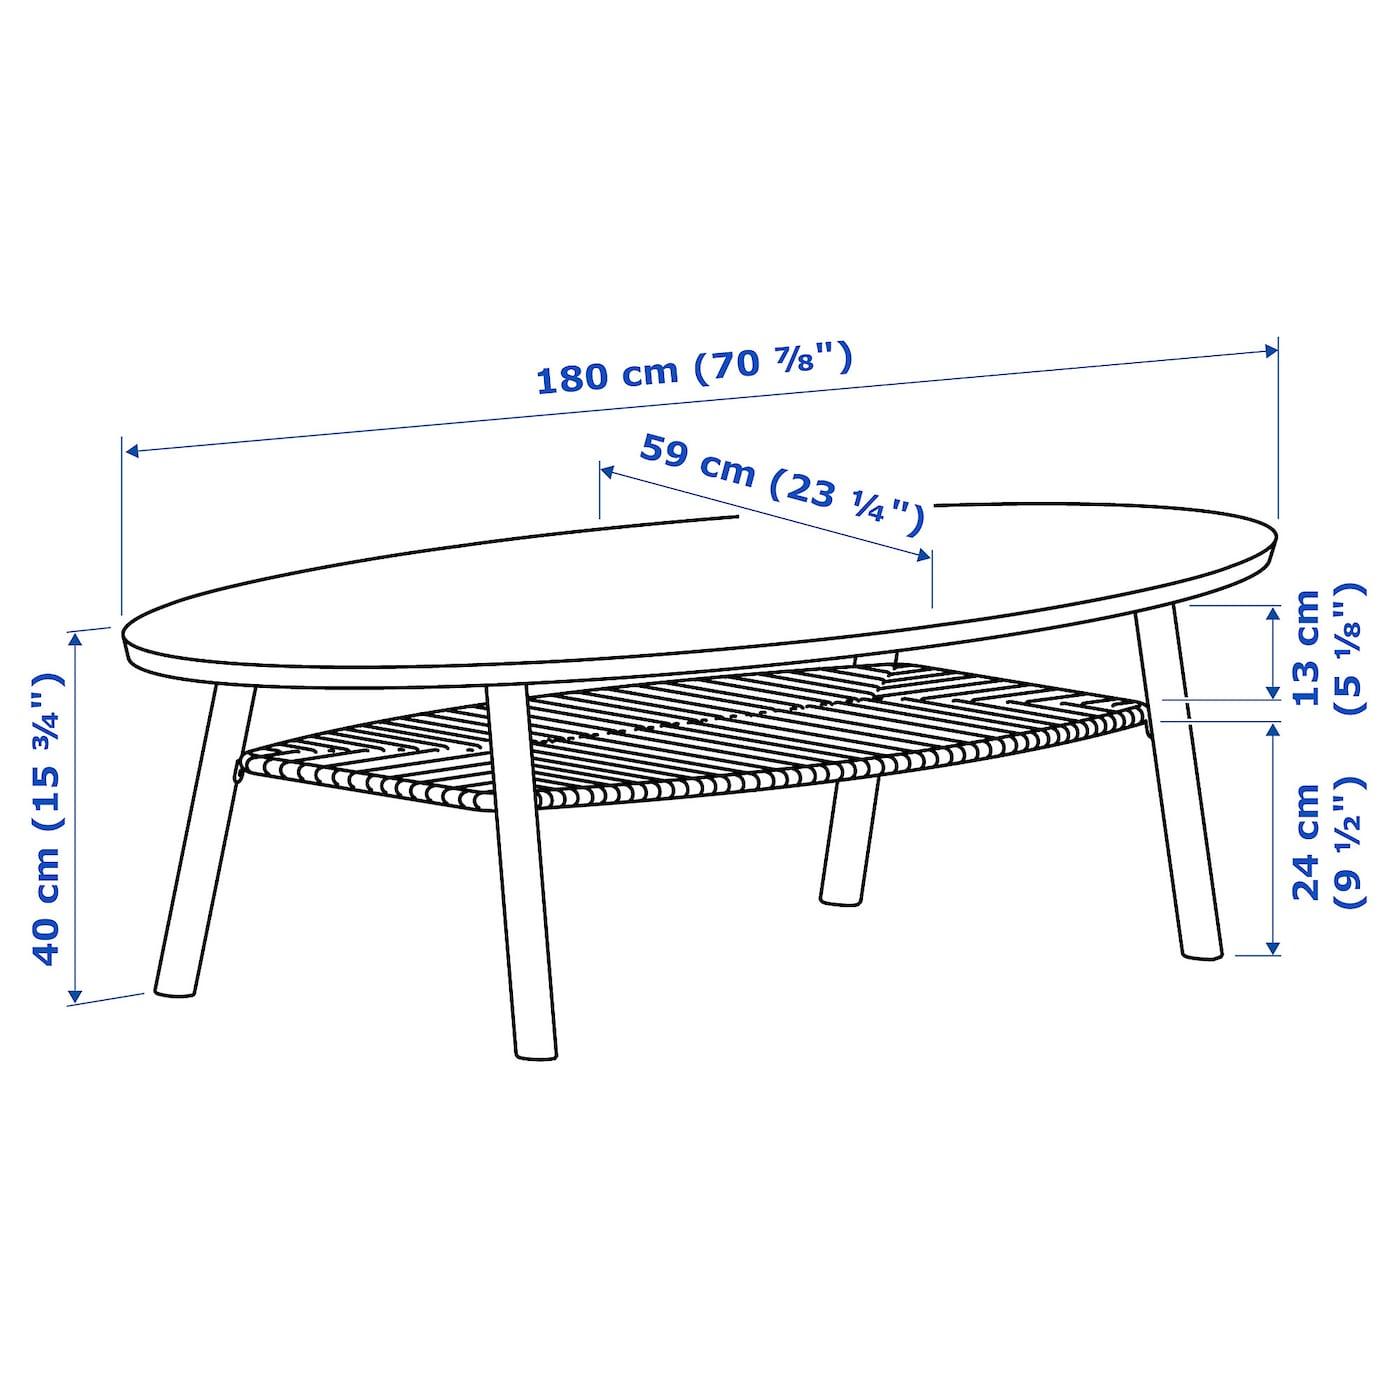 Stockholm Coffee Table Walnut Veneer 180x59 Cm Ikea Ireland [ 1400 x 1400 Pixel ]